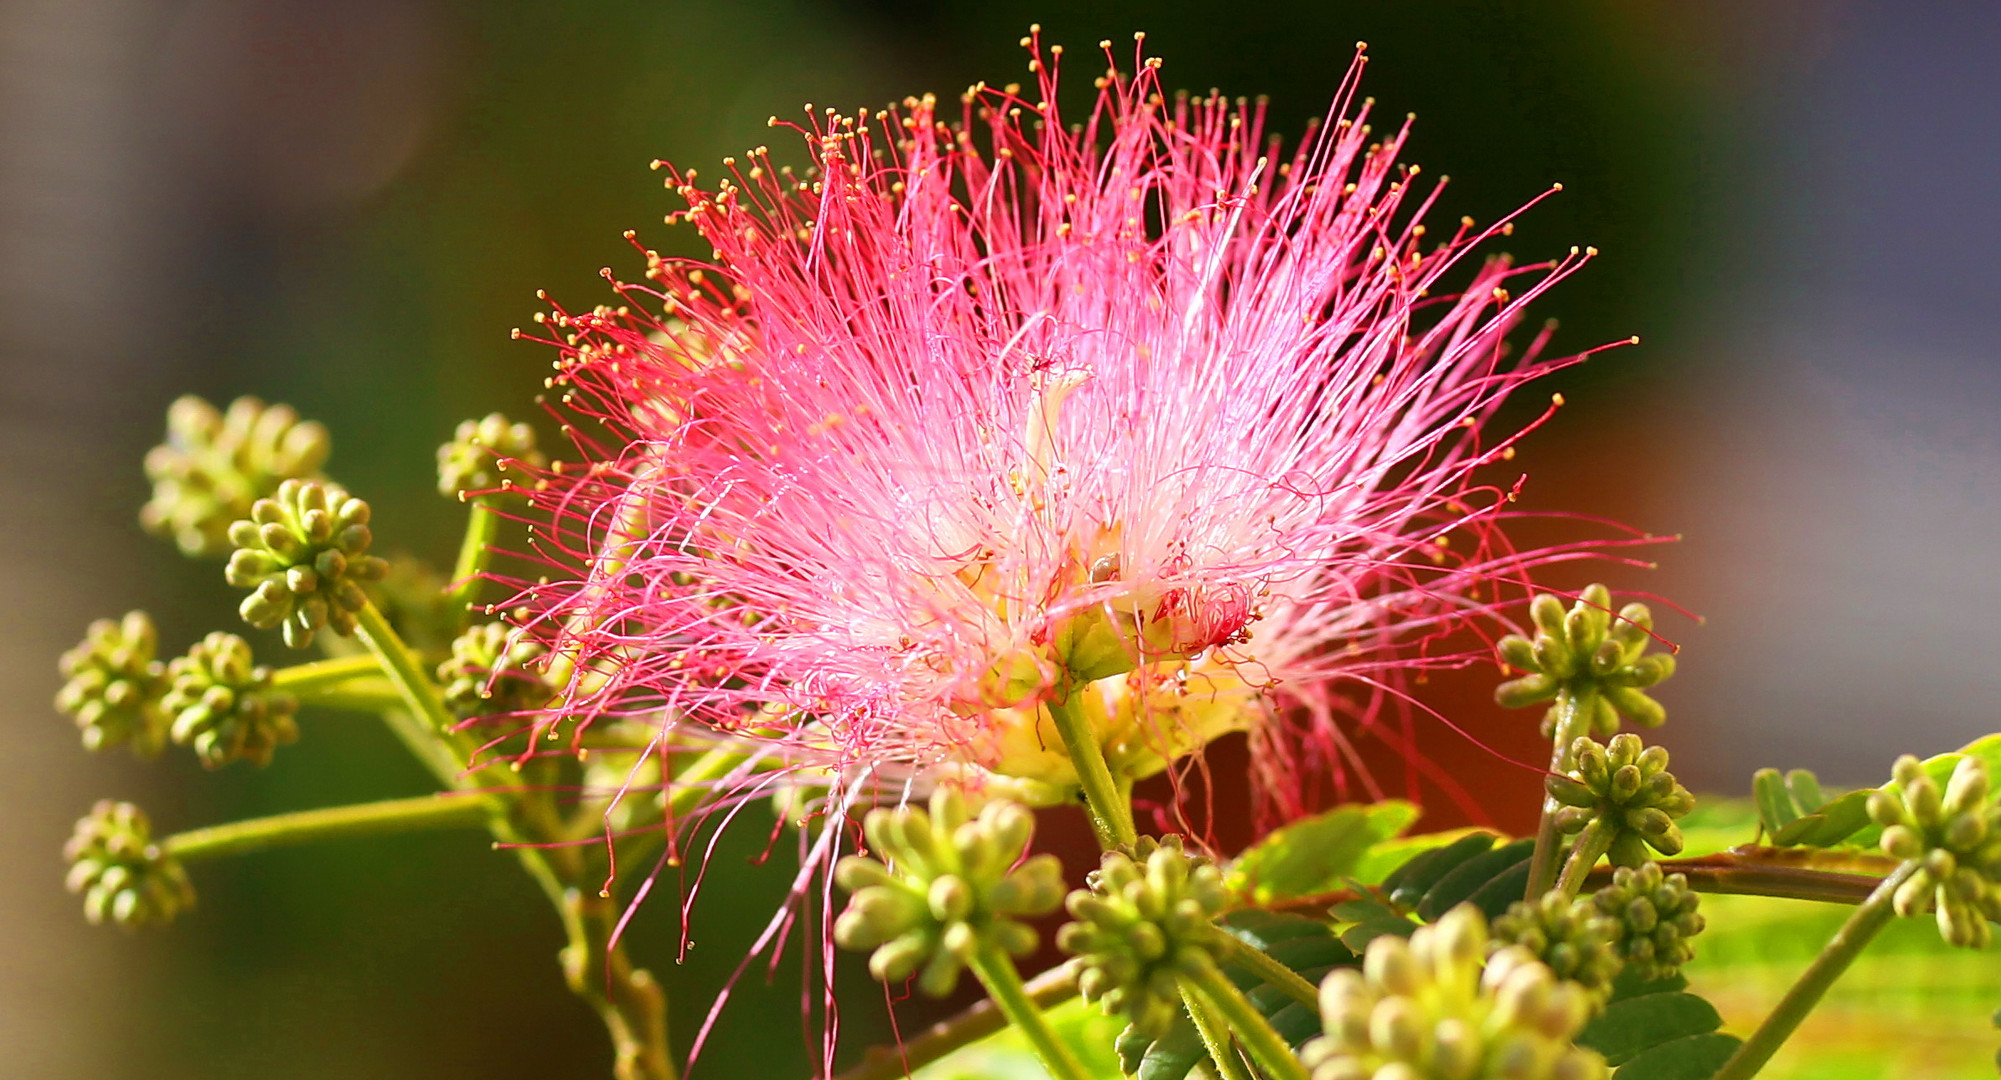 Seidenbaum-Blüte